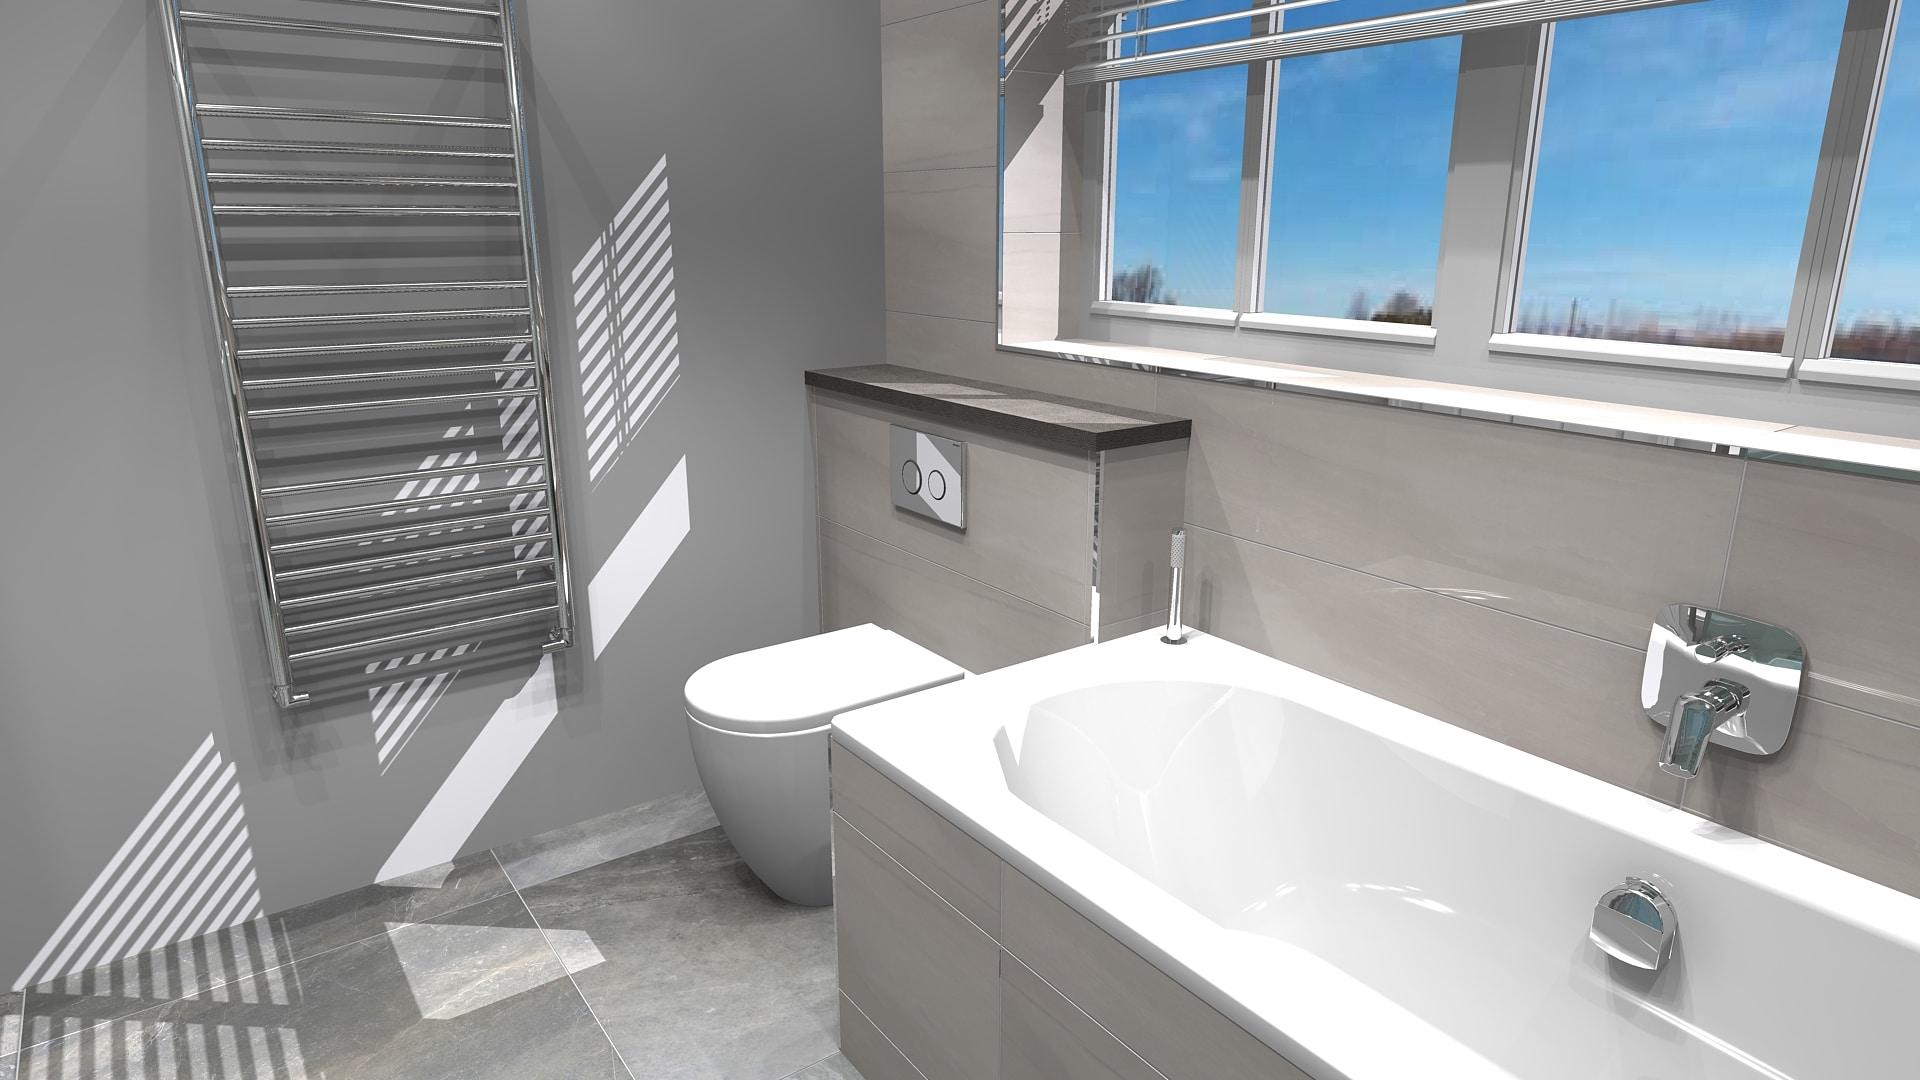 Chessington Pipeline Mir Family Bathroom